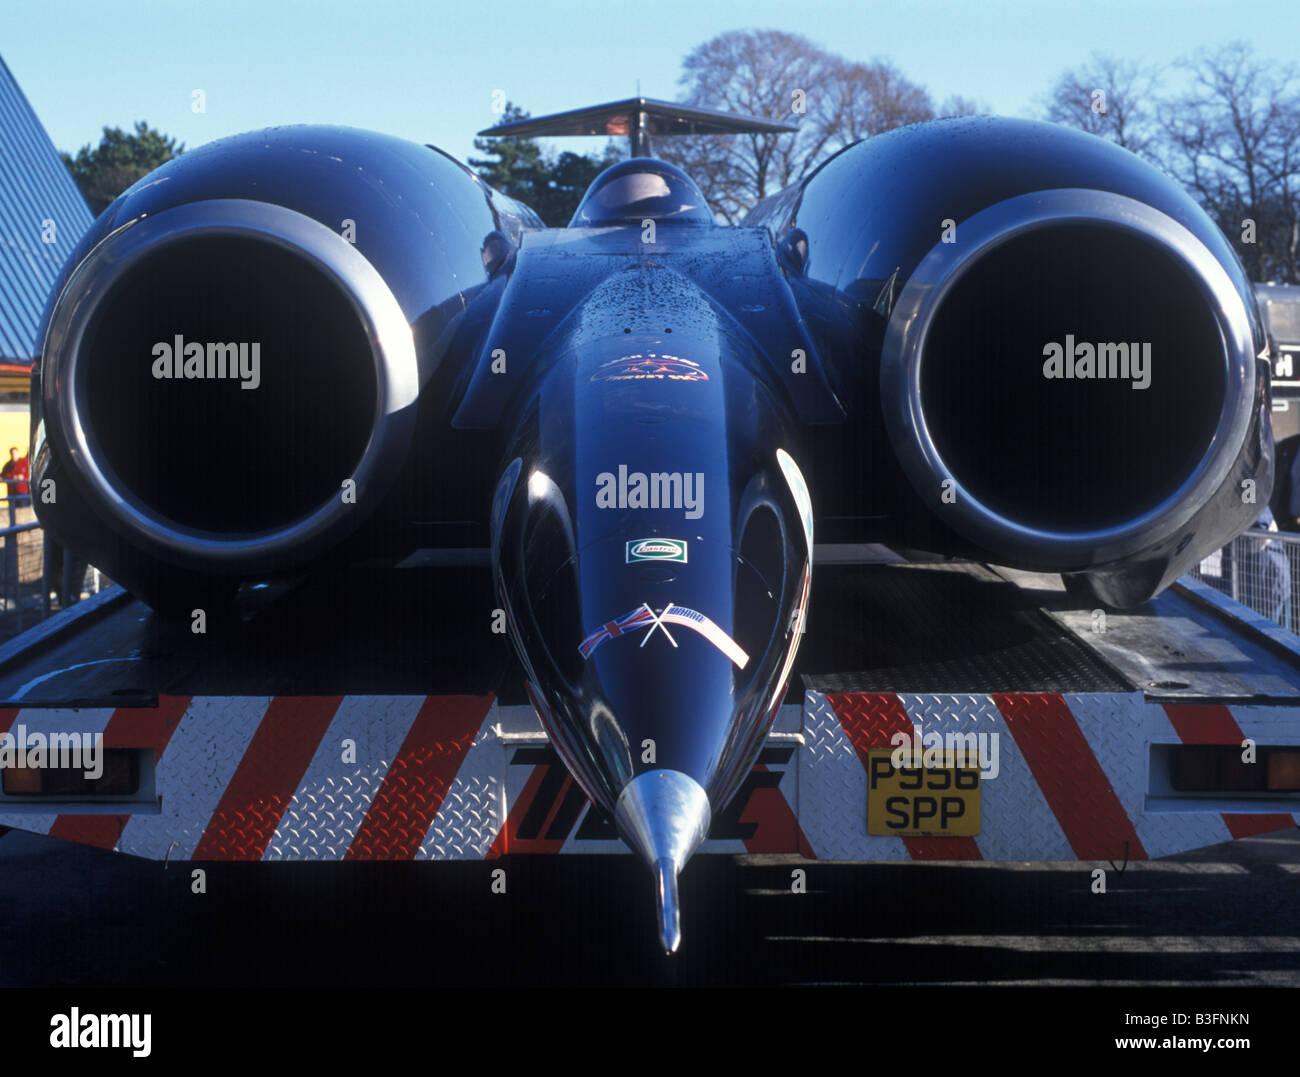 Thrust SSC world land speed record 763.035 mph mach 1.02 - Stock Image